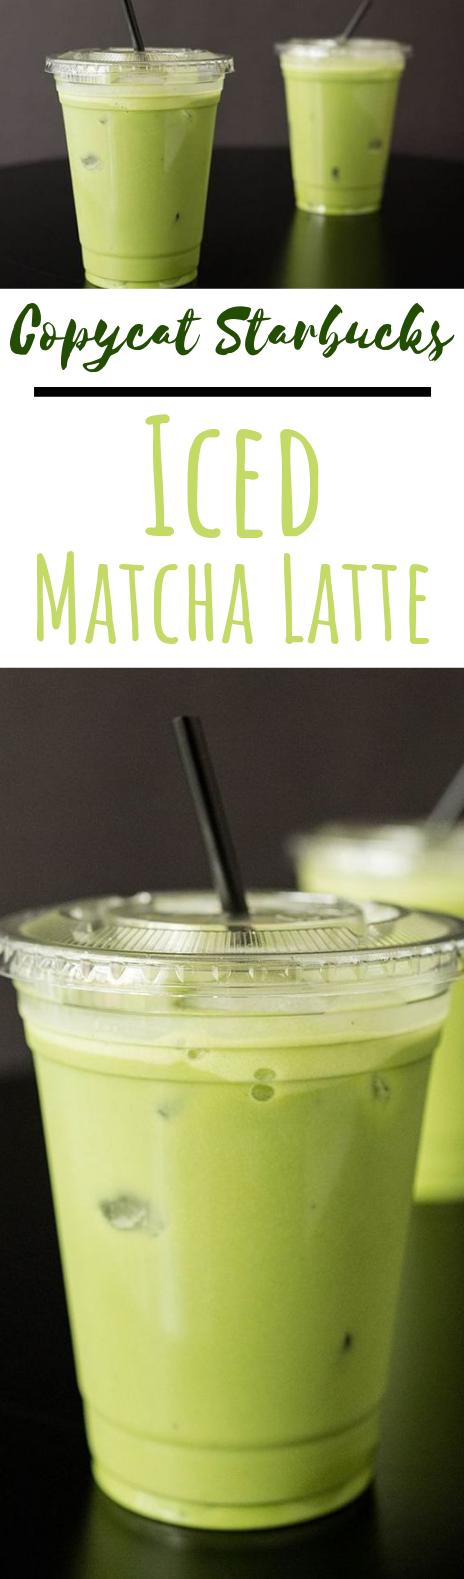 Copycat Starbucks Iced Matcha Latte #drinks #latte